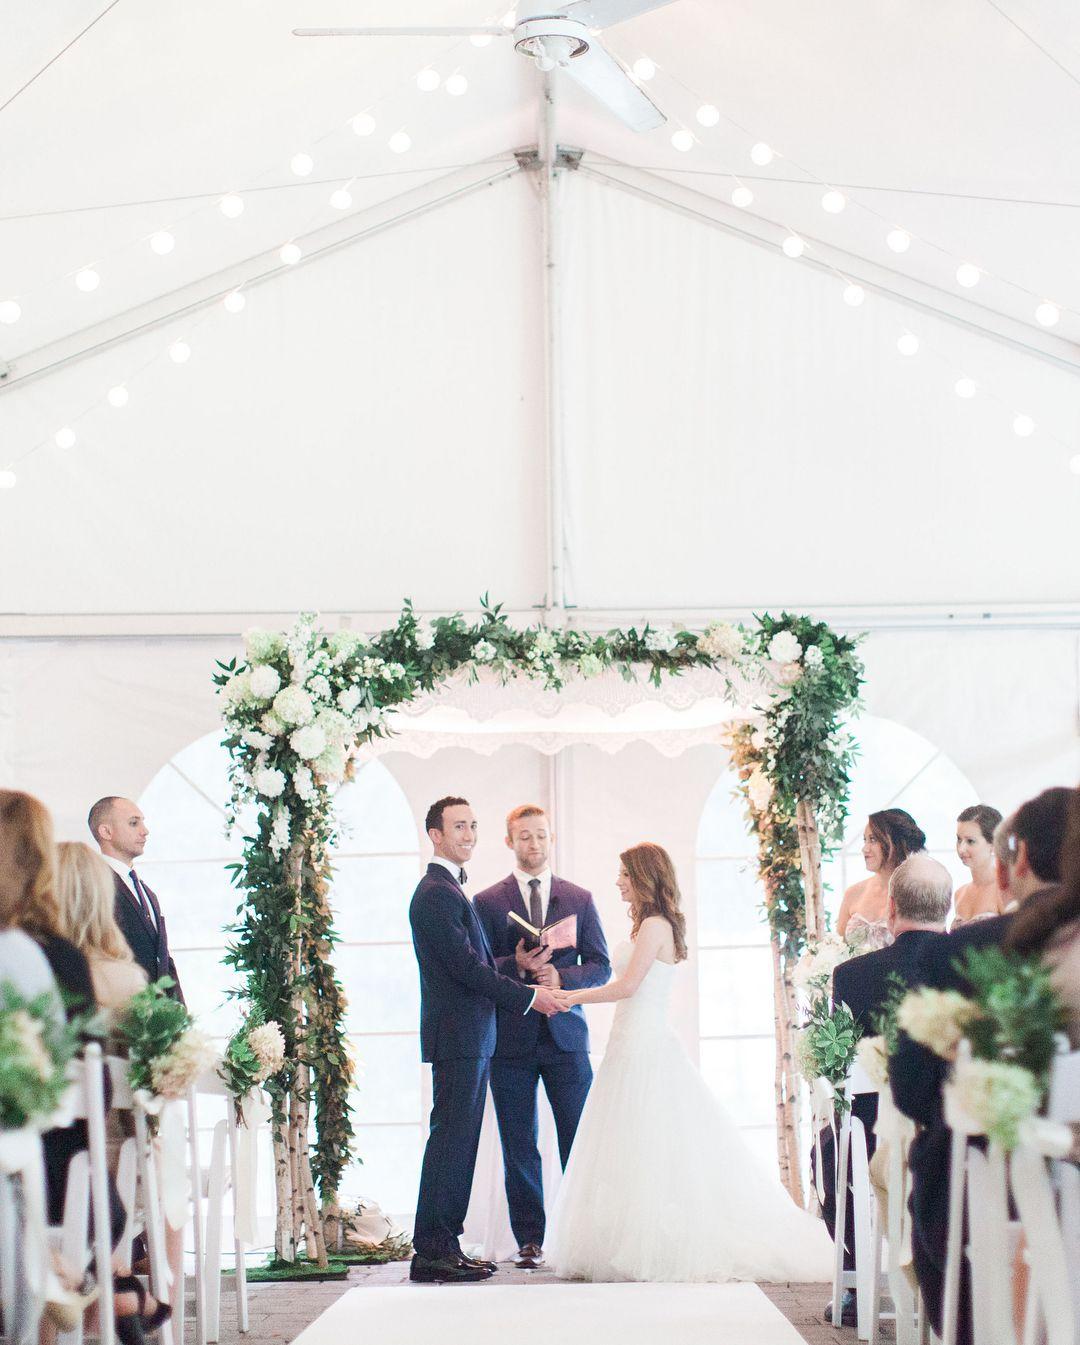 Wedding decorations tent october 2018 Gorgeous Wedding Chuppah Silver Birch Chuppah Rustic Wedding